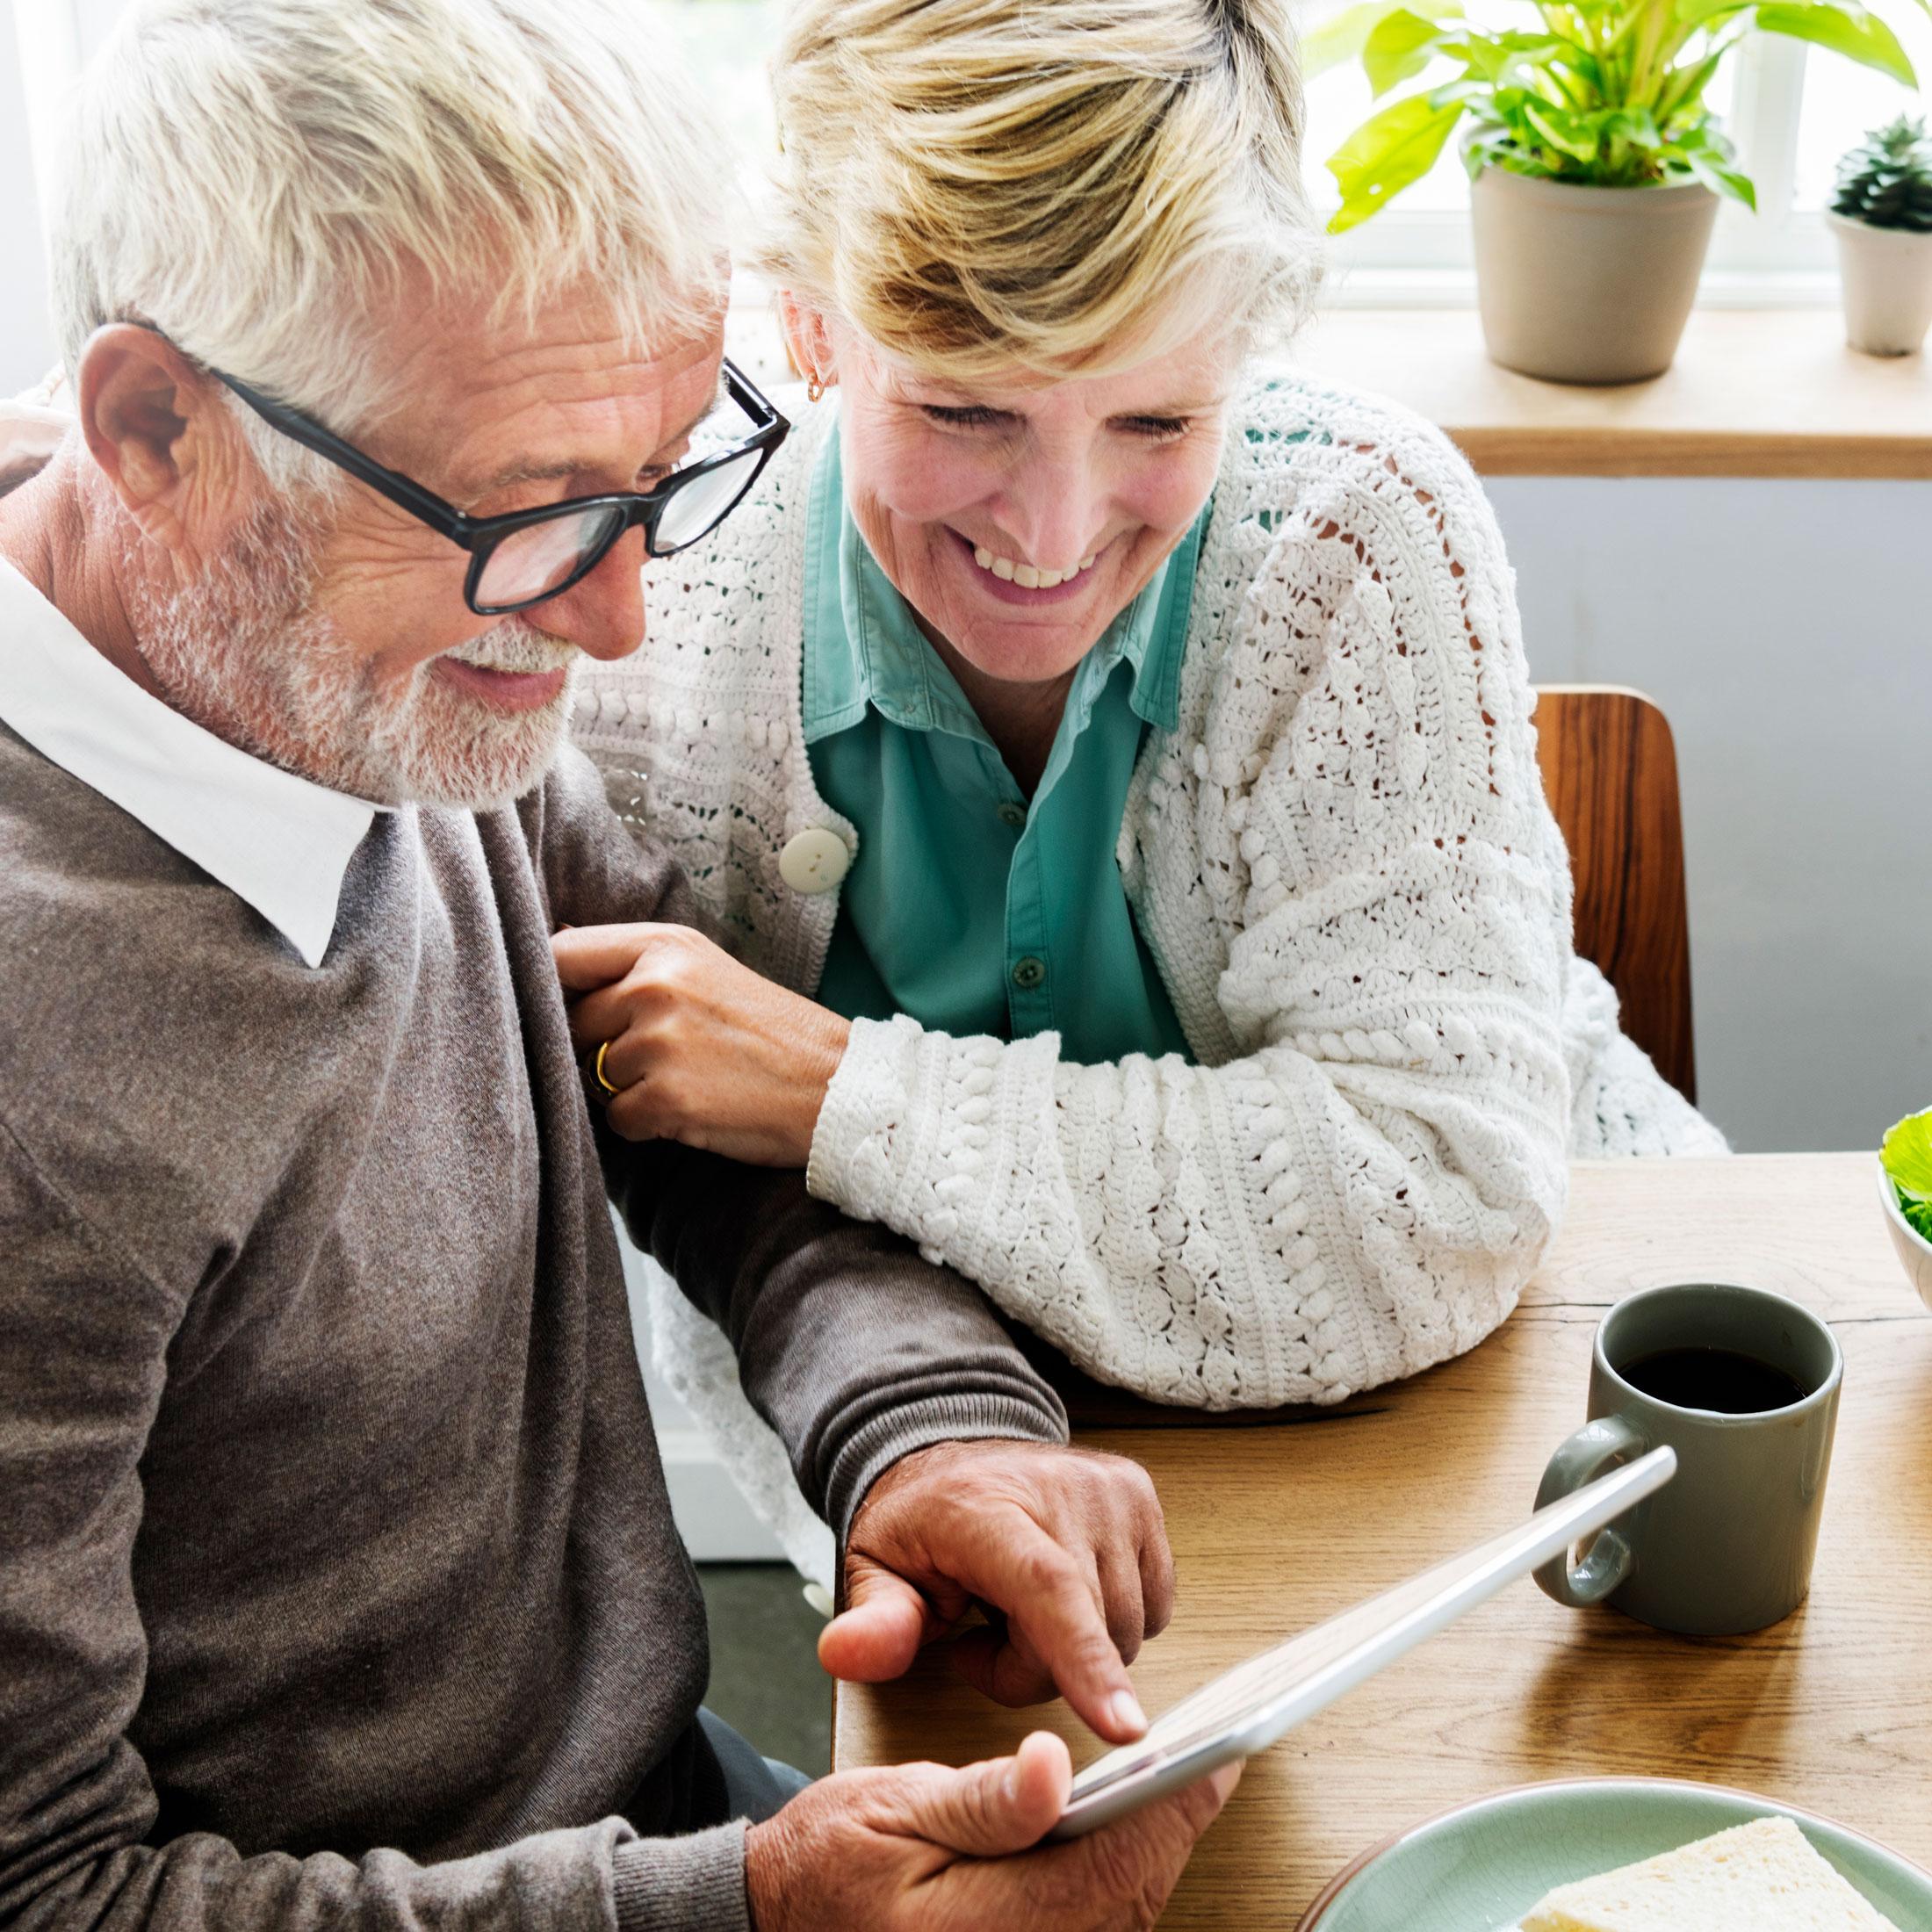 senior-pensionary-husband-wife-couple-living-conce-PKSPYCD